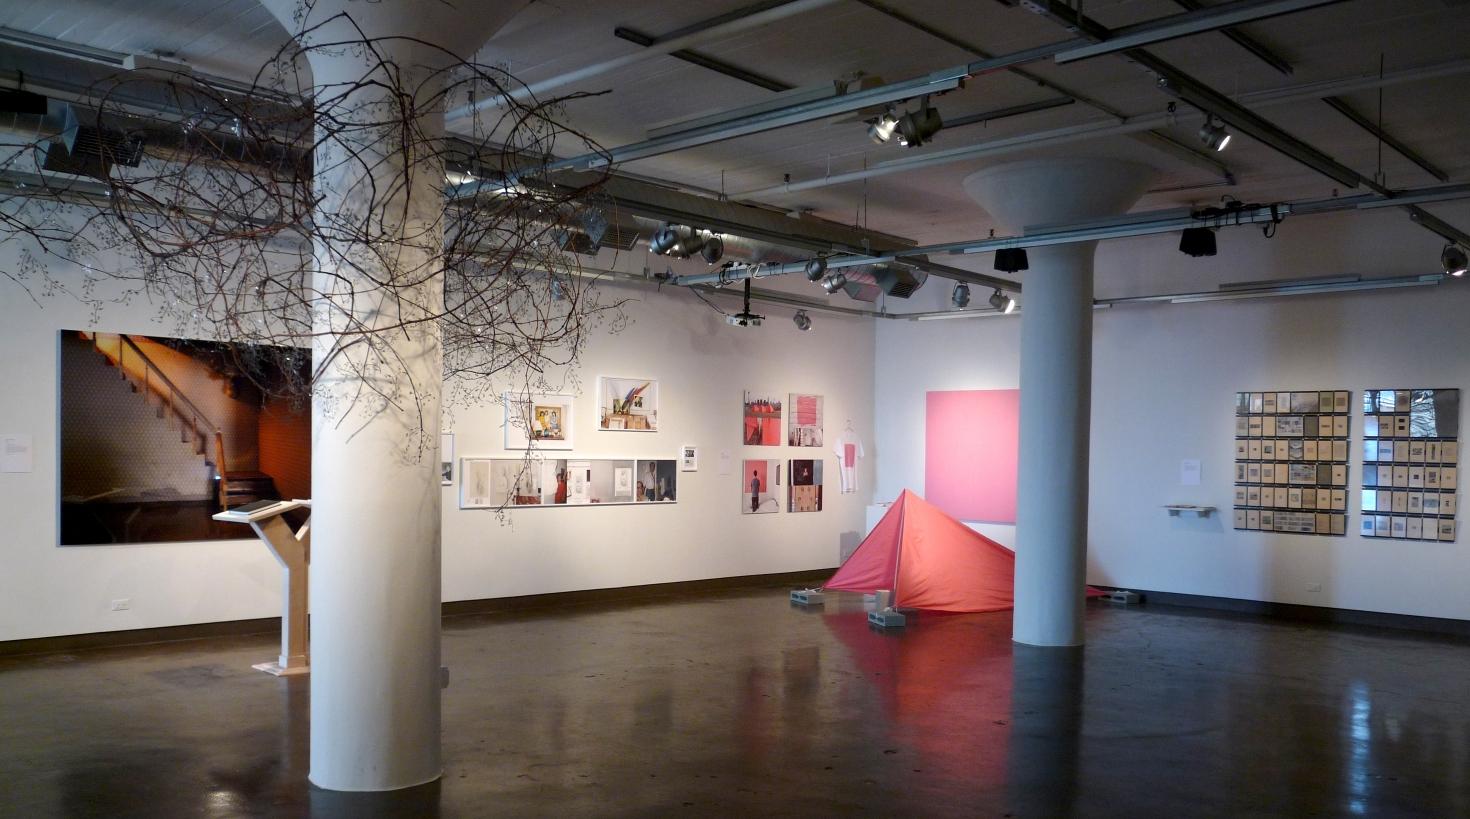 SVA exhibit, School of Visual Arts